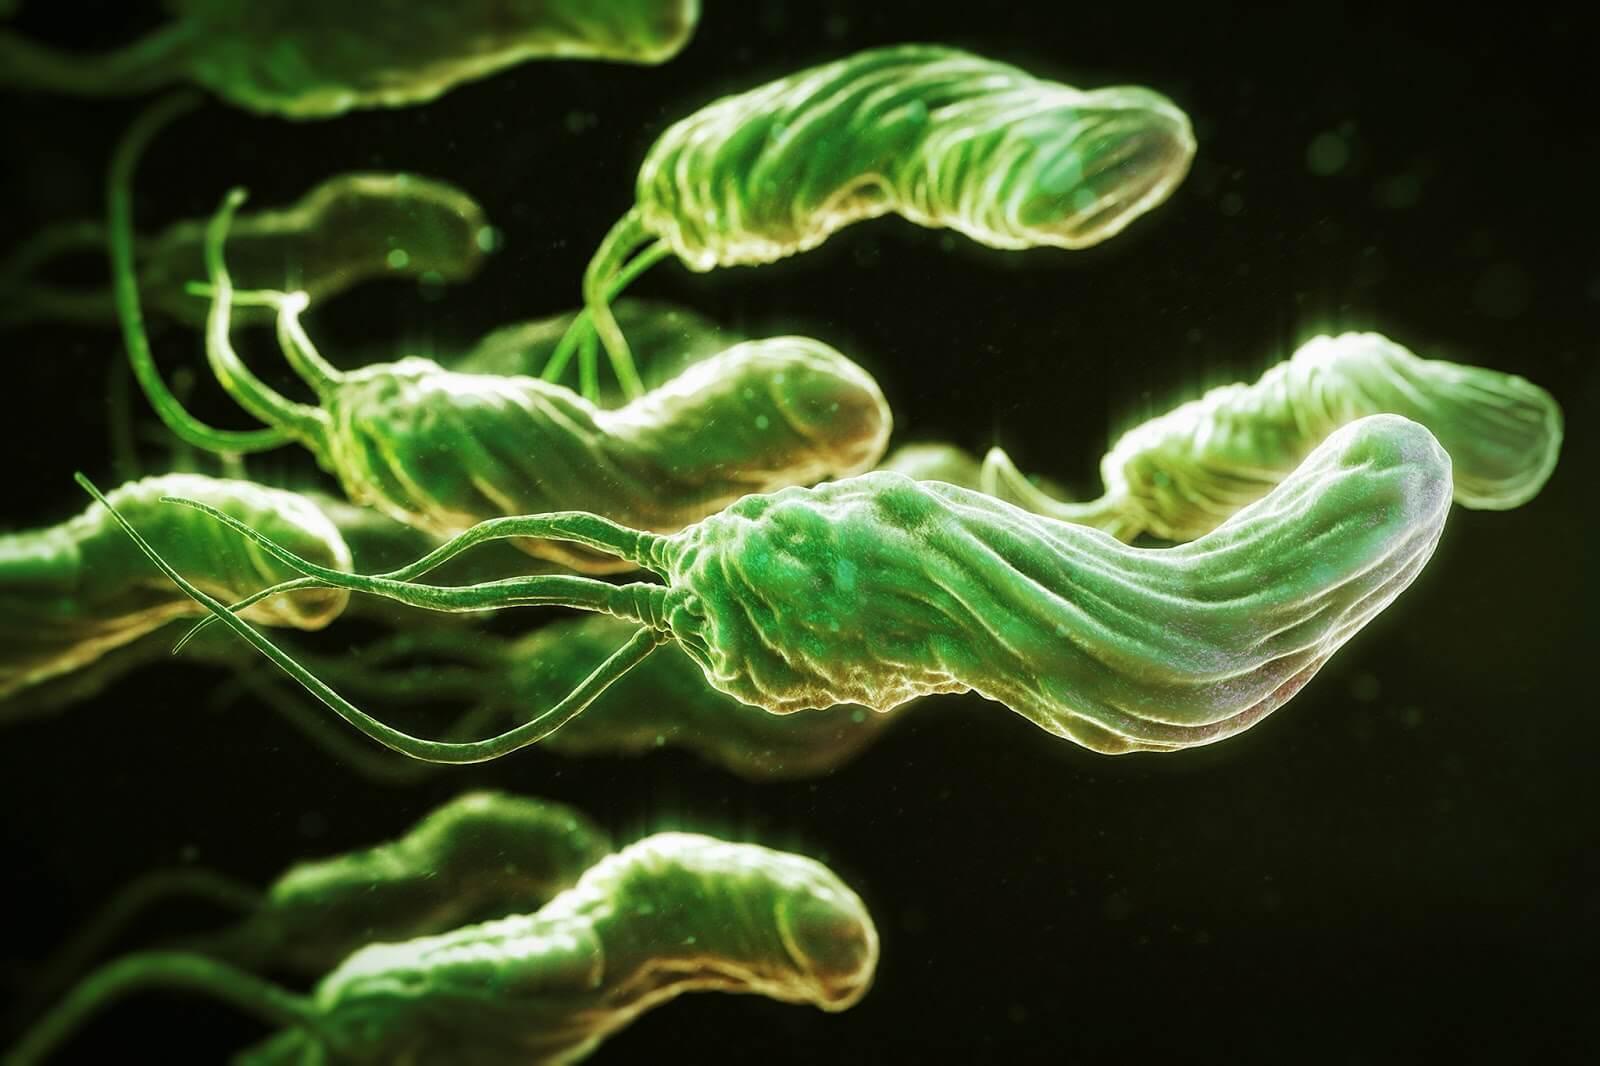 Диагностика Helicobacter pylori (биохимически по уреазе в биоптате)